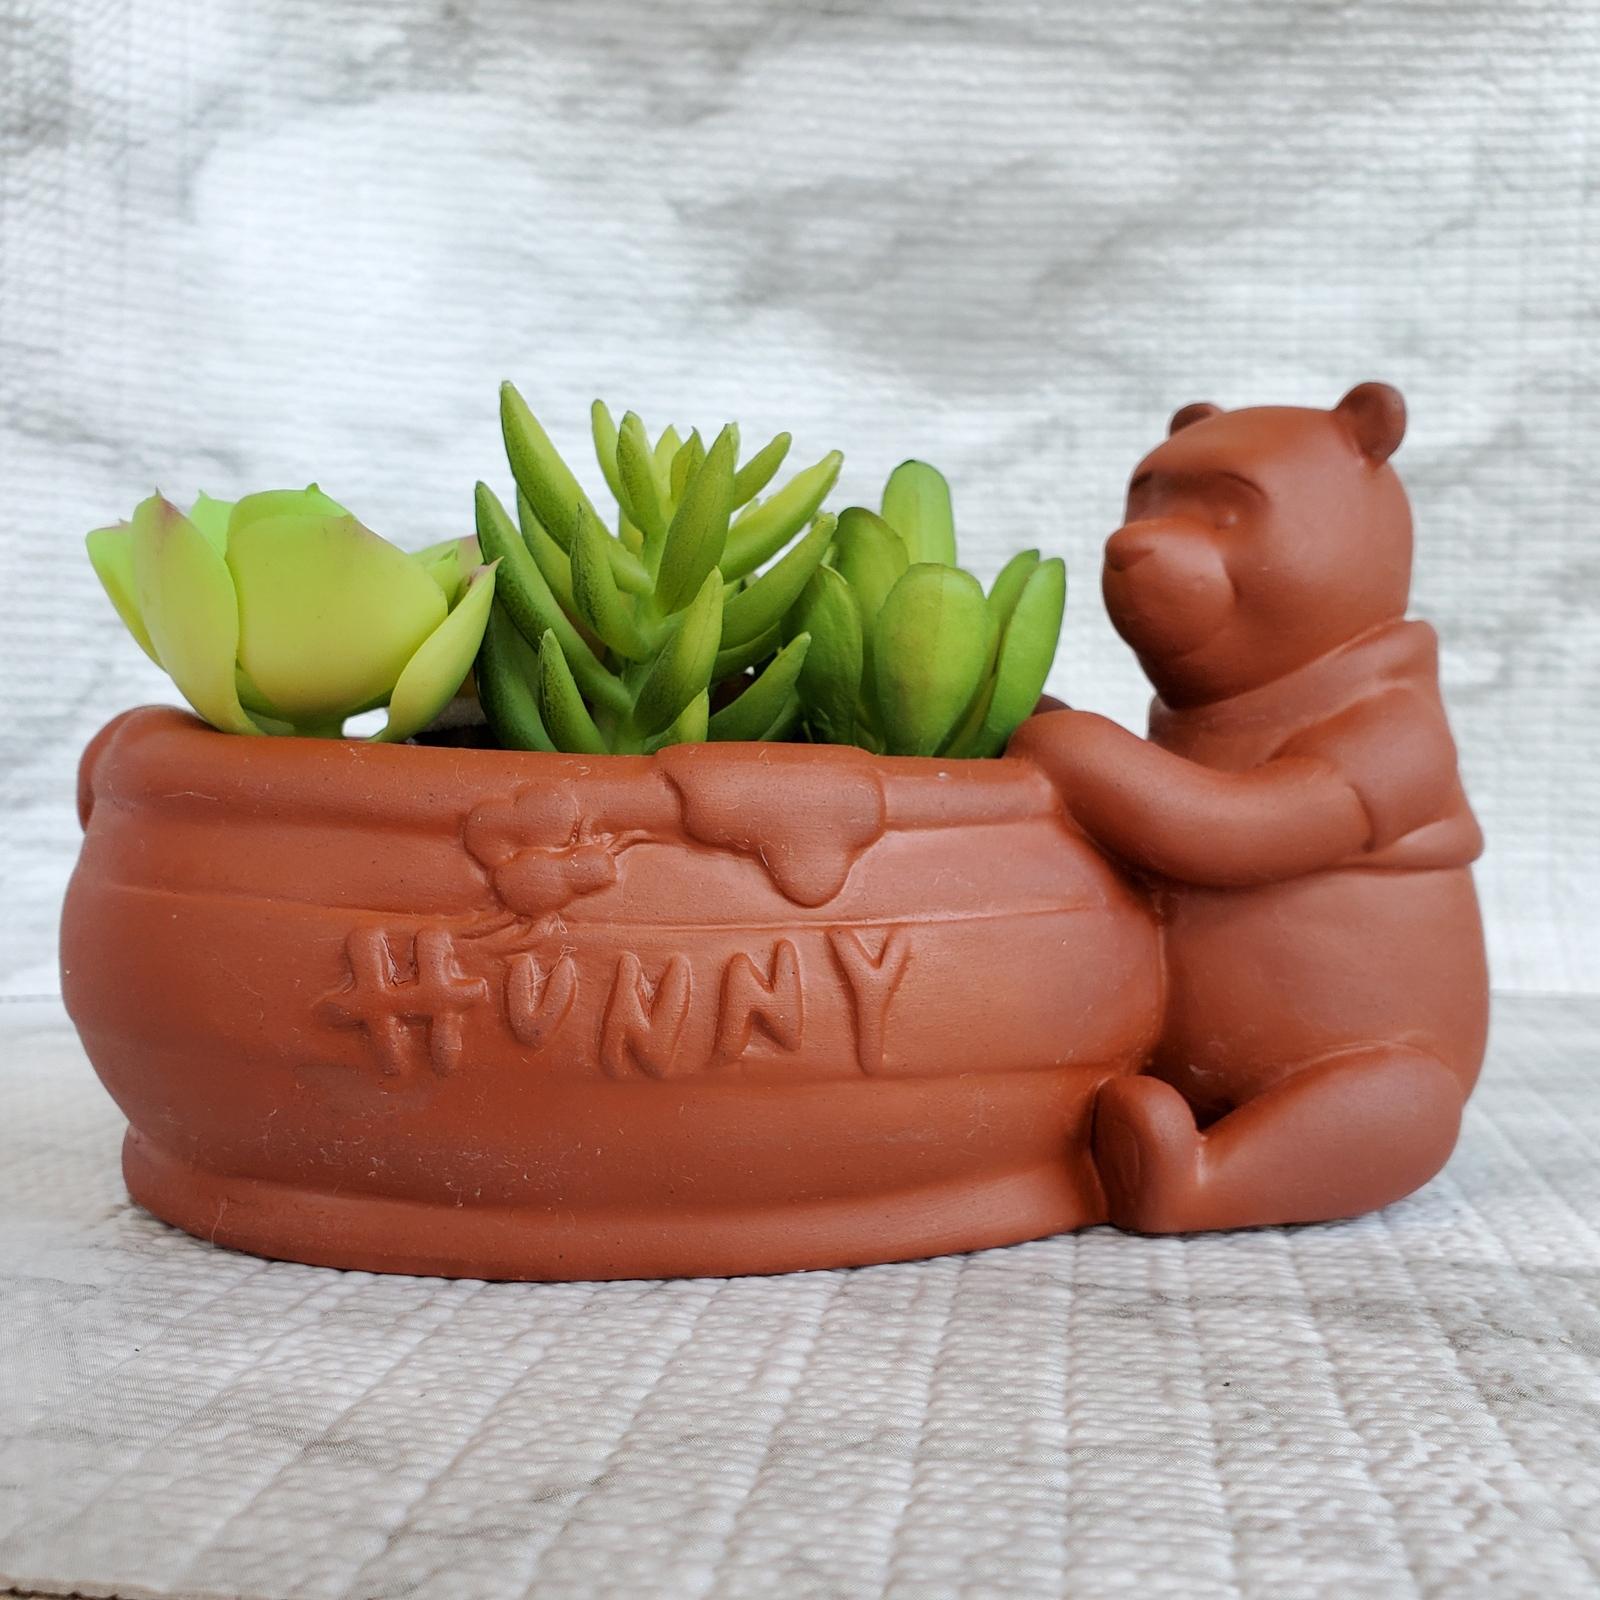 Winniepoohplanter 1